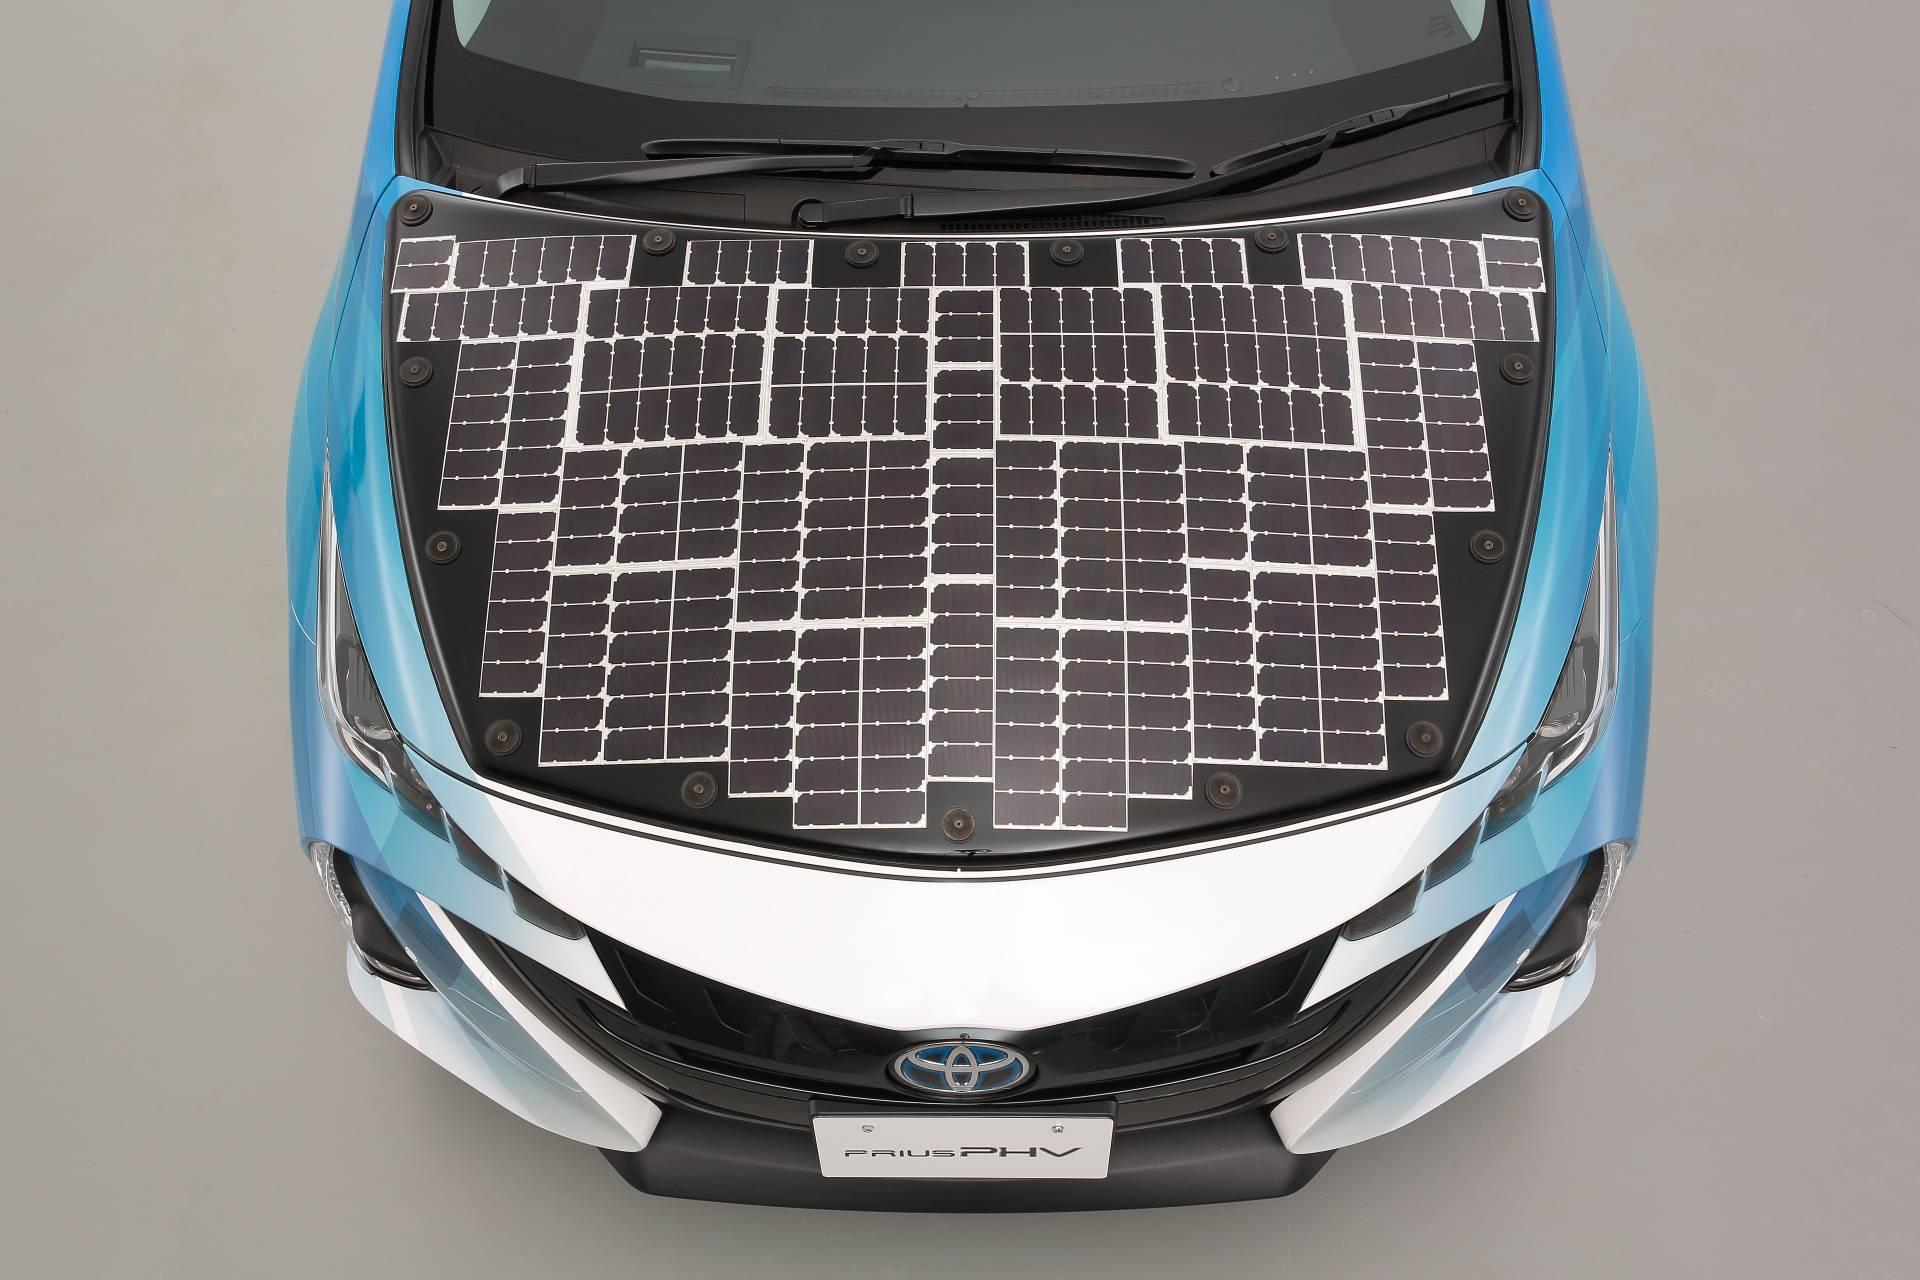 Toyota-Prius-Prime-With-Solar-Panels-11